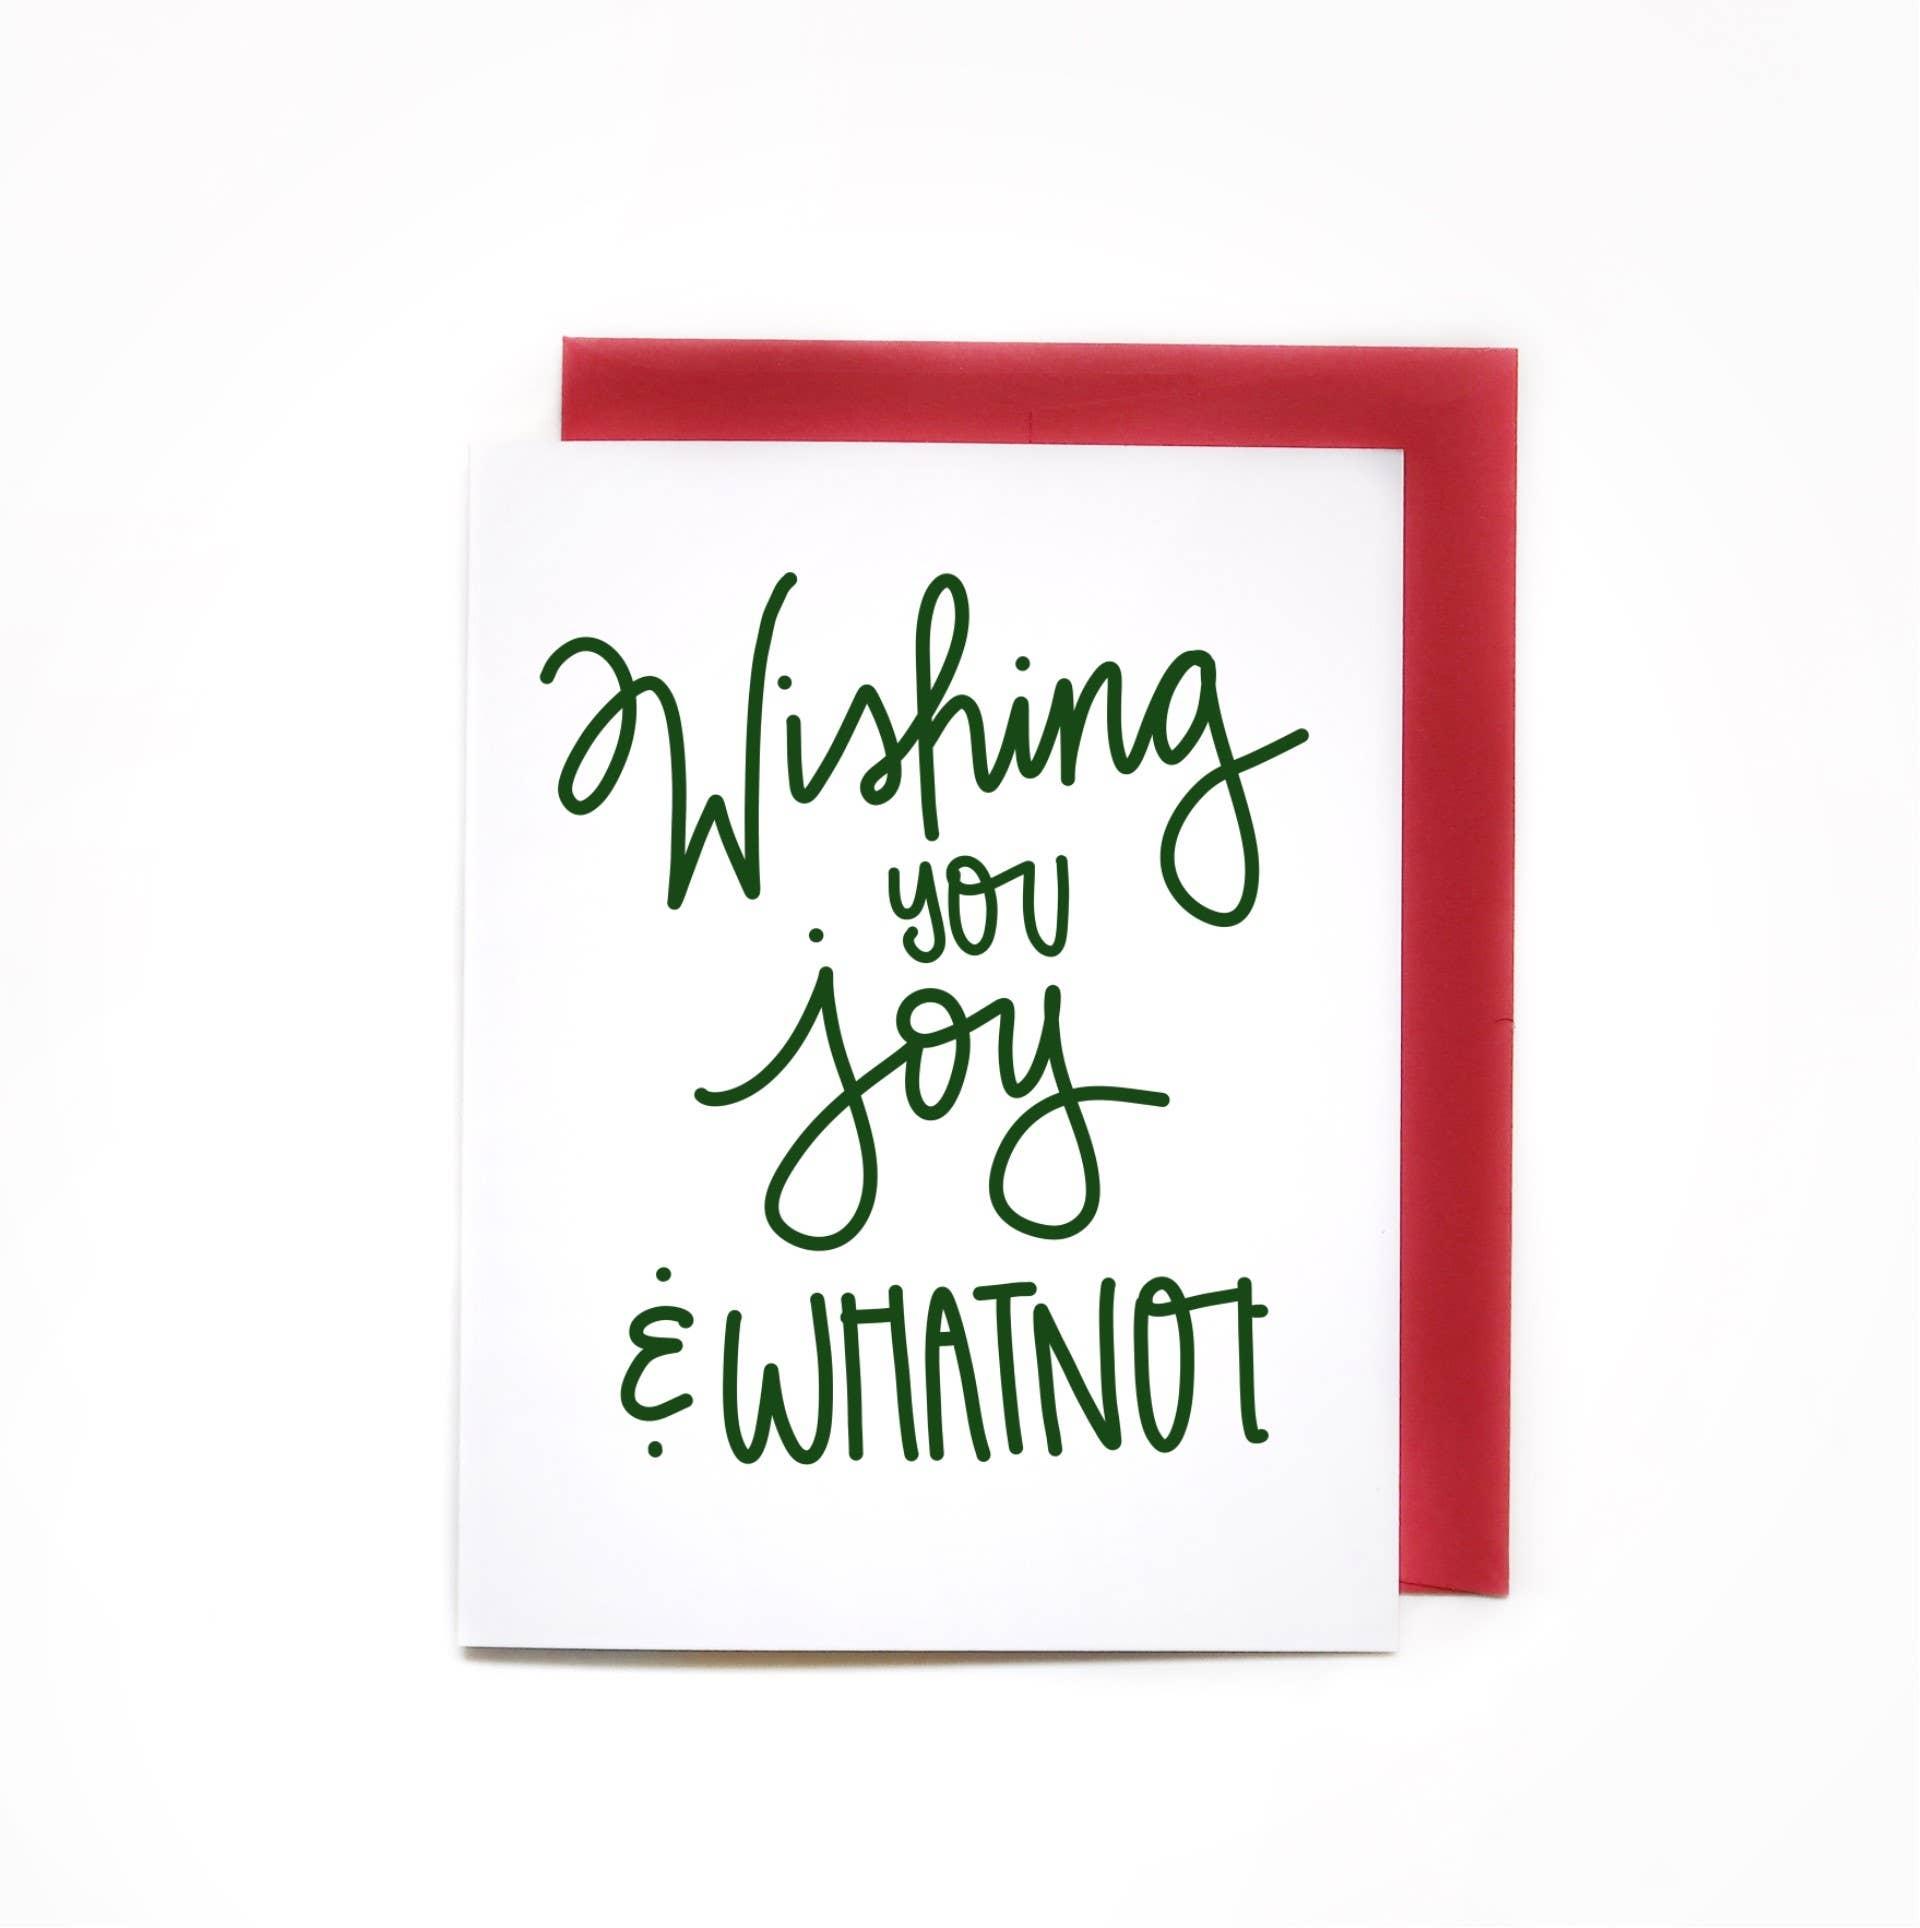 Wishing You Joy and Whatnot, Sarcastic Holiday Greeting Card | Trada Marketplace